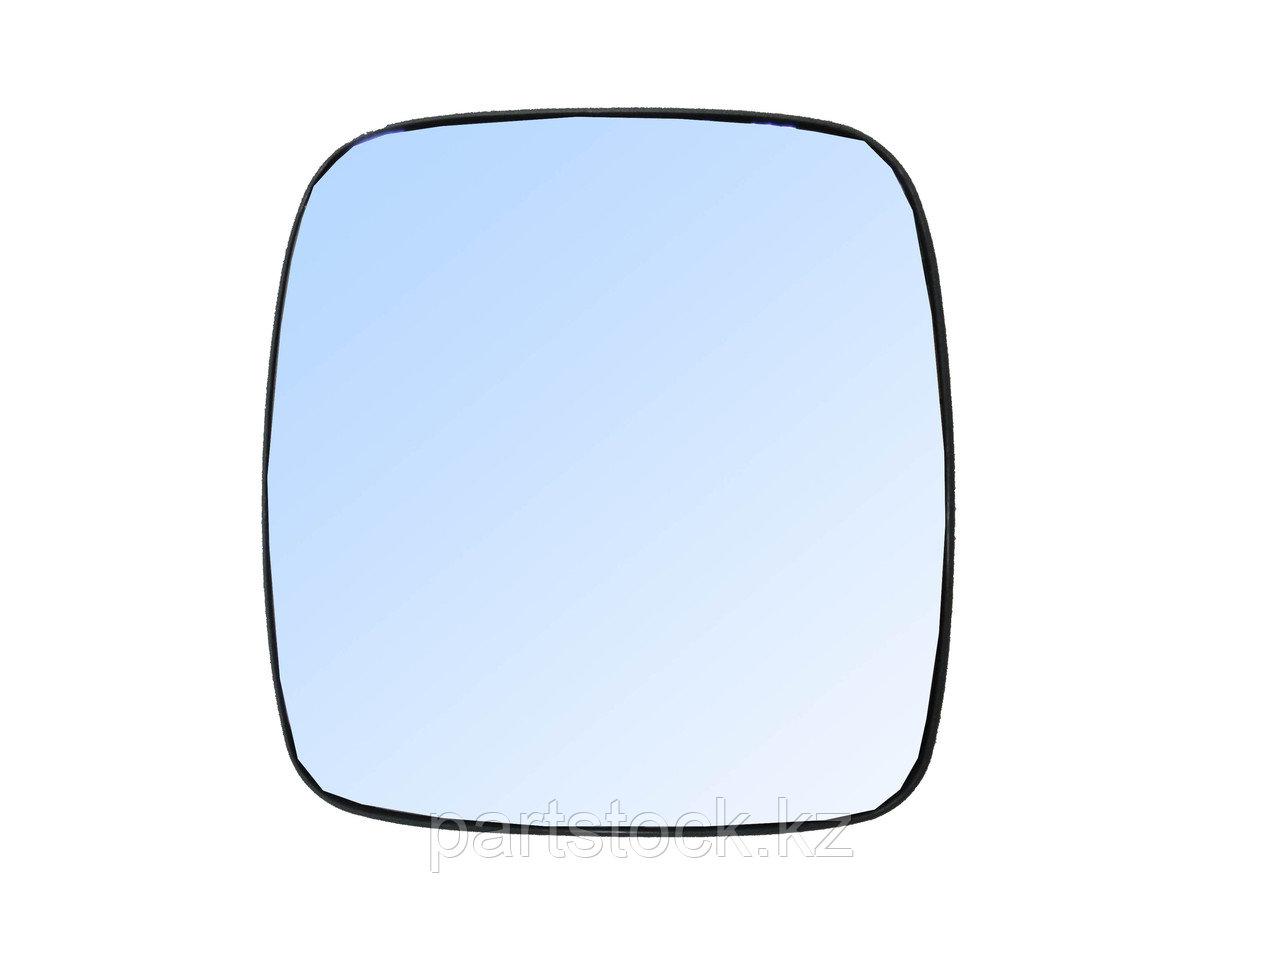 Зеркало зад вида в сборе  малое  на / для MAN, МАН, BOSS 81637306512 I